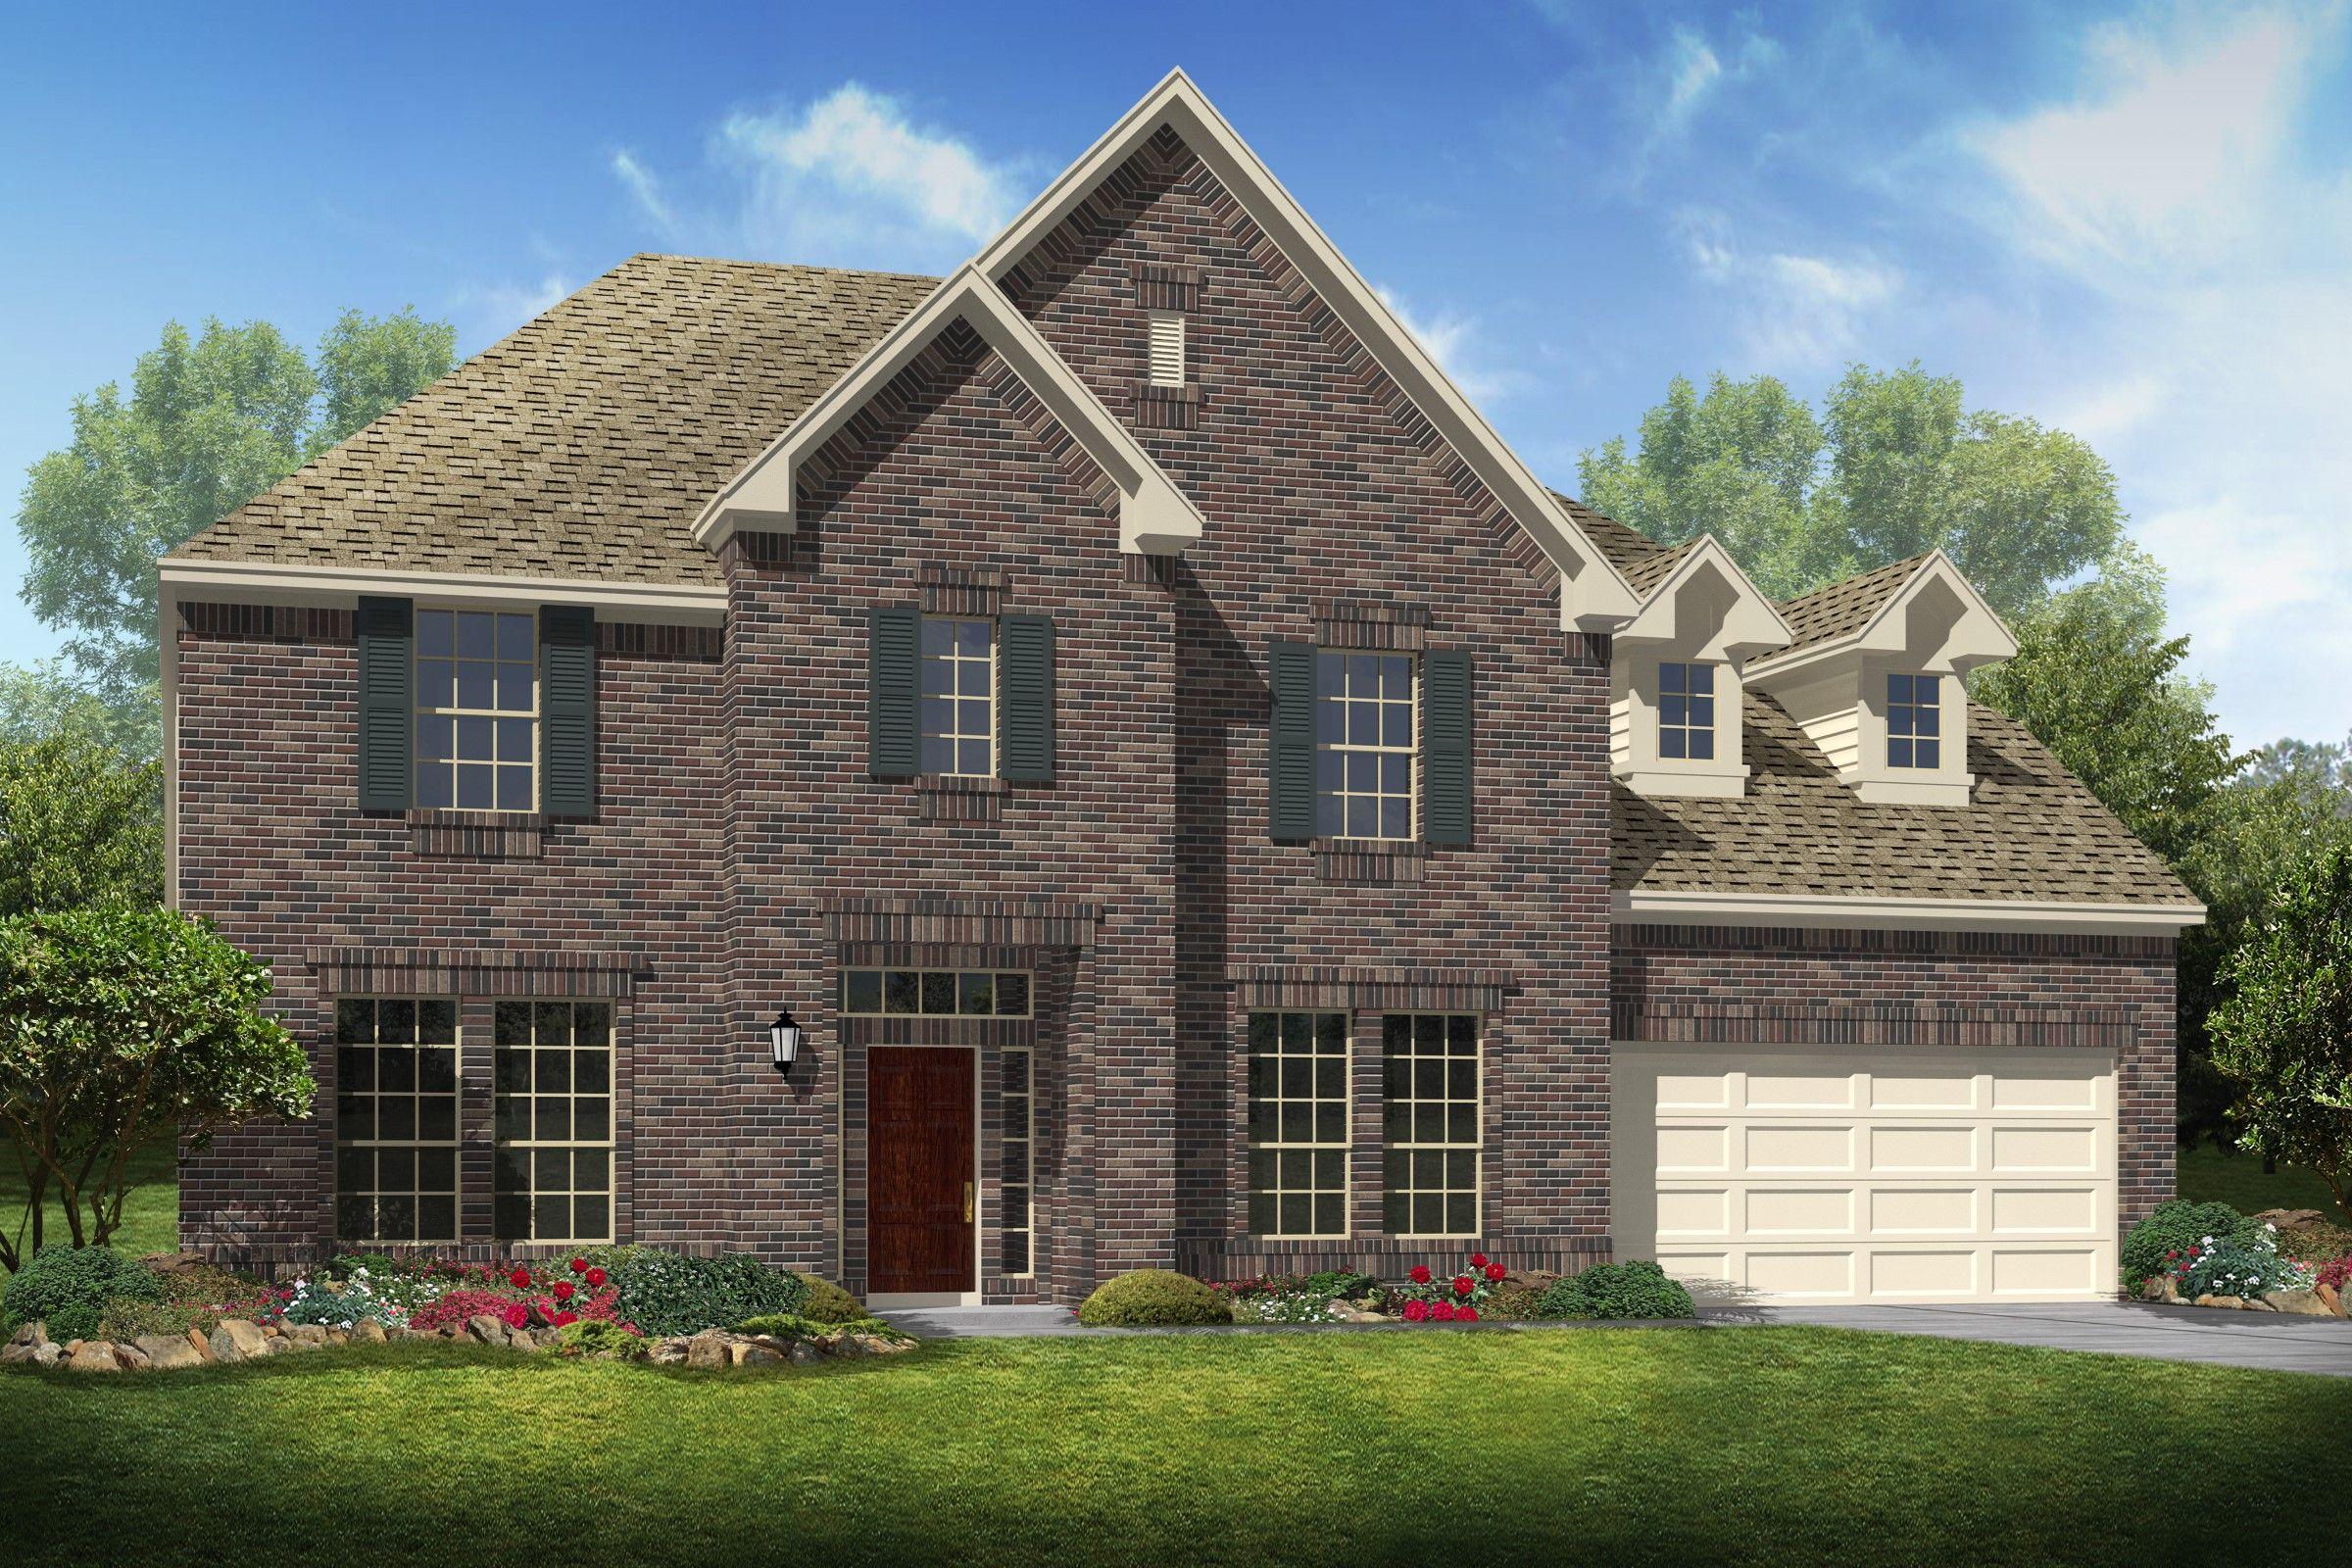 Single Family for Sale at Mandalay 2030 Opal Field Lane Rosenberg, Texas 77469 United States